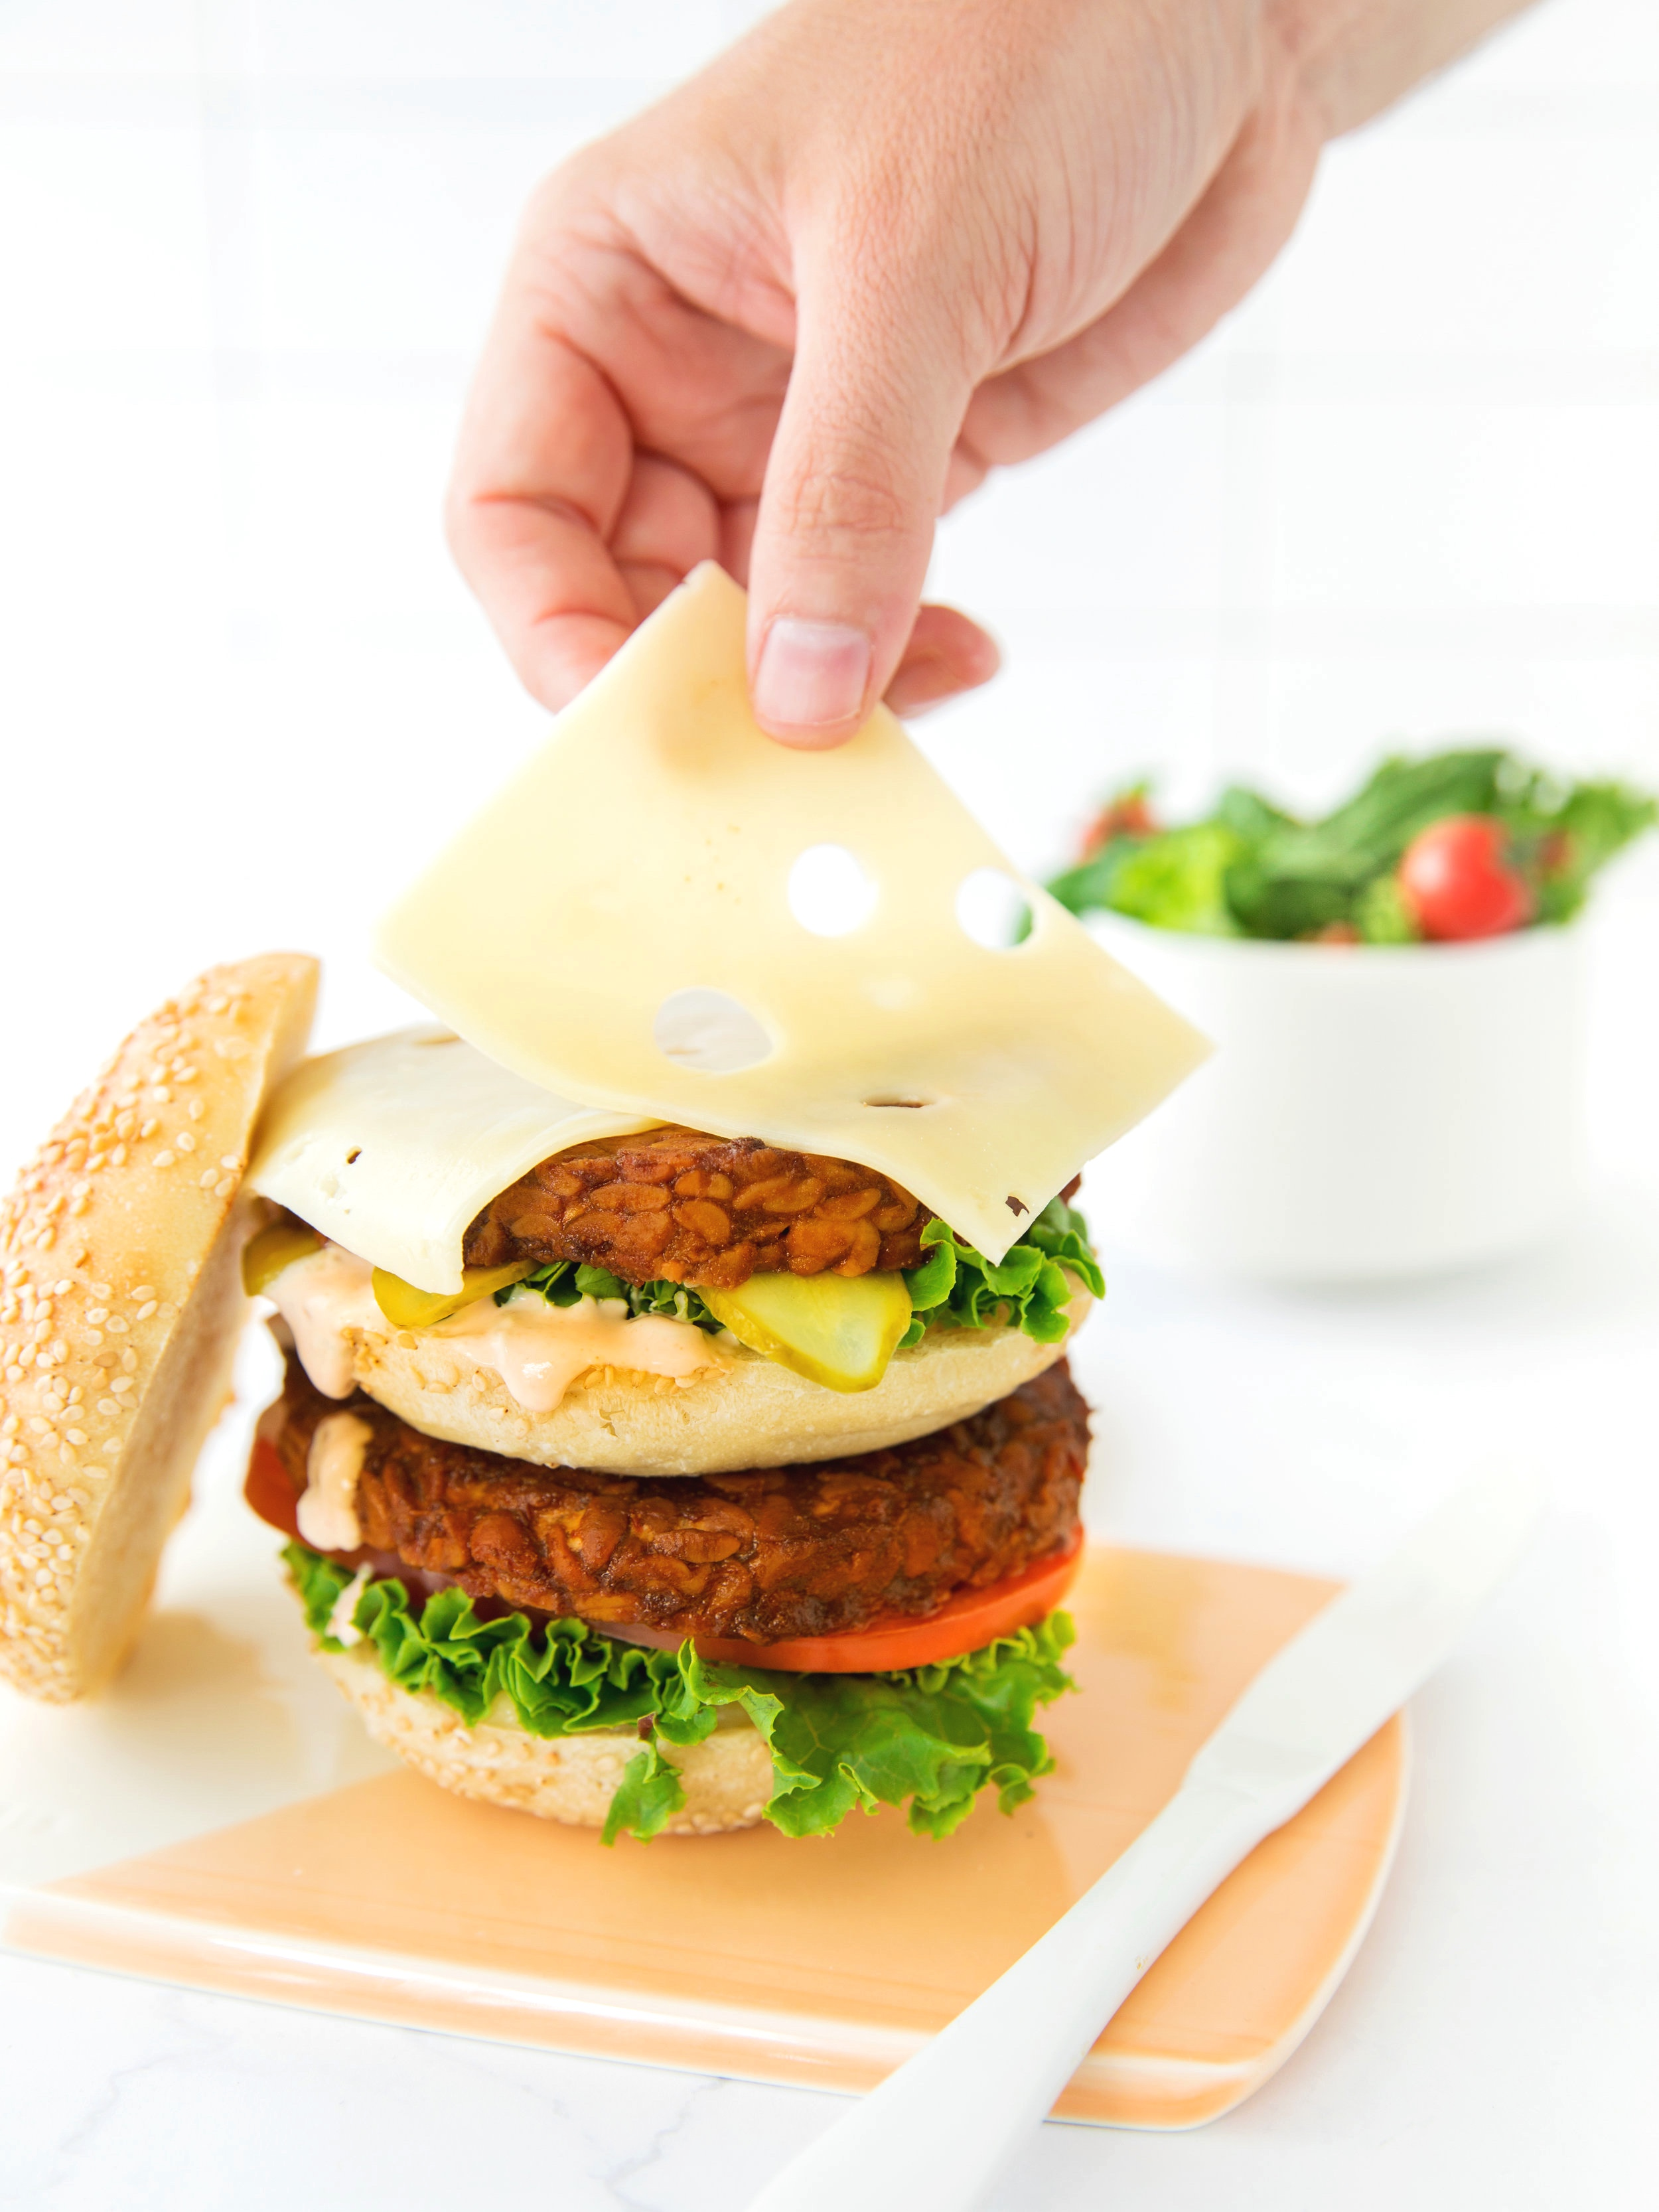 Jarlsberg_Burger-4.jpg